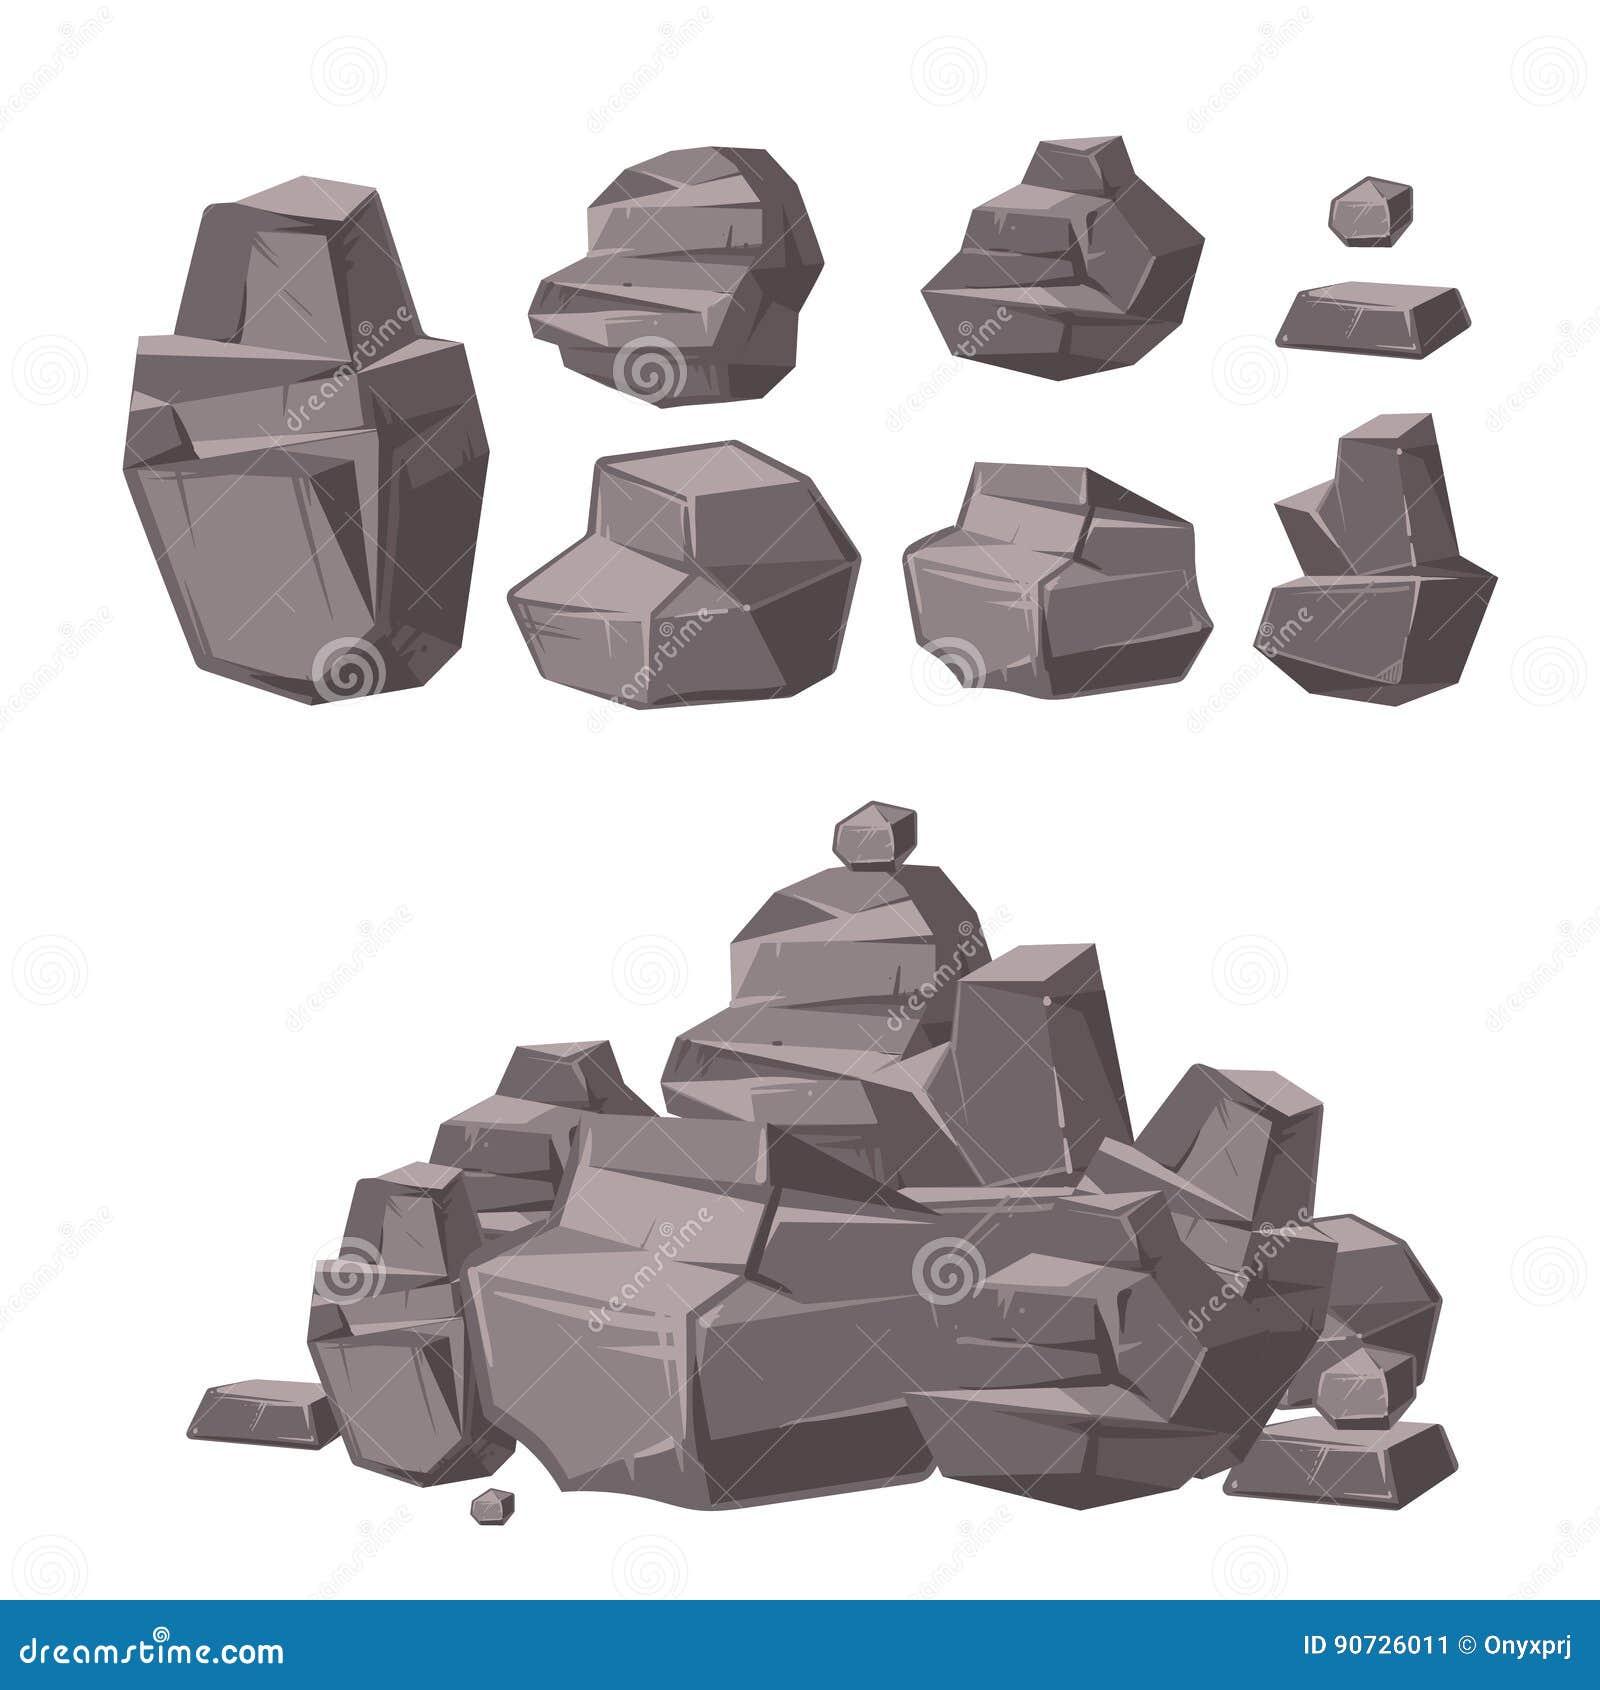 Cartoon 3d rock, granite stones, stack of boulders vector set, architecture elements for landscaping design